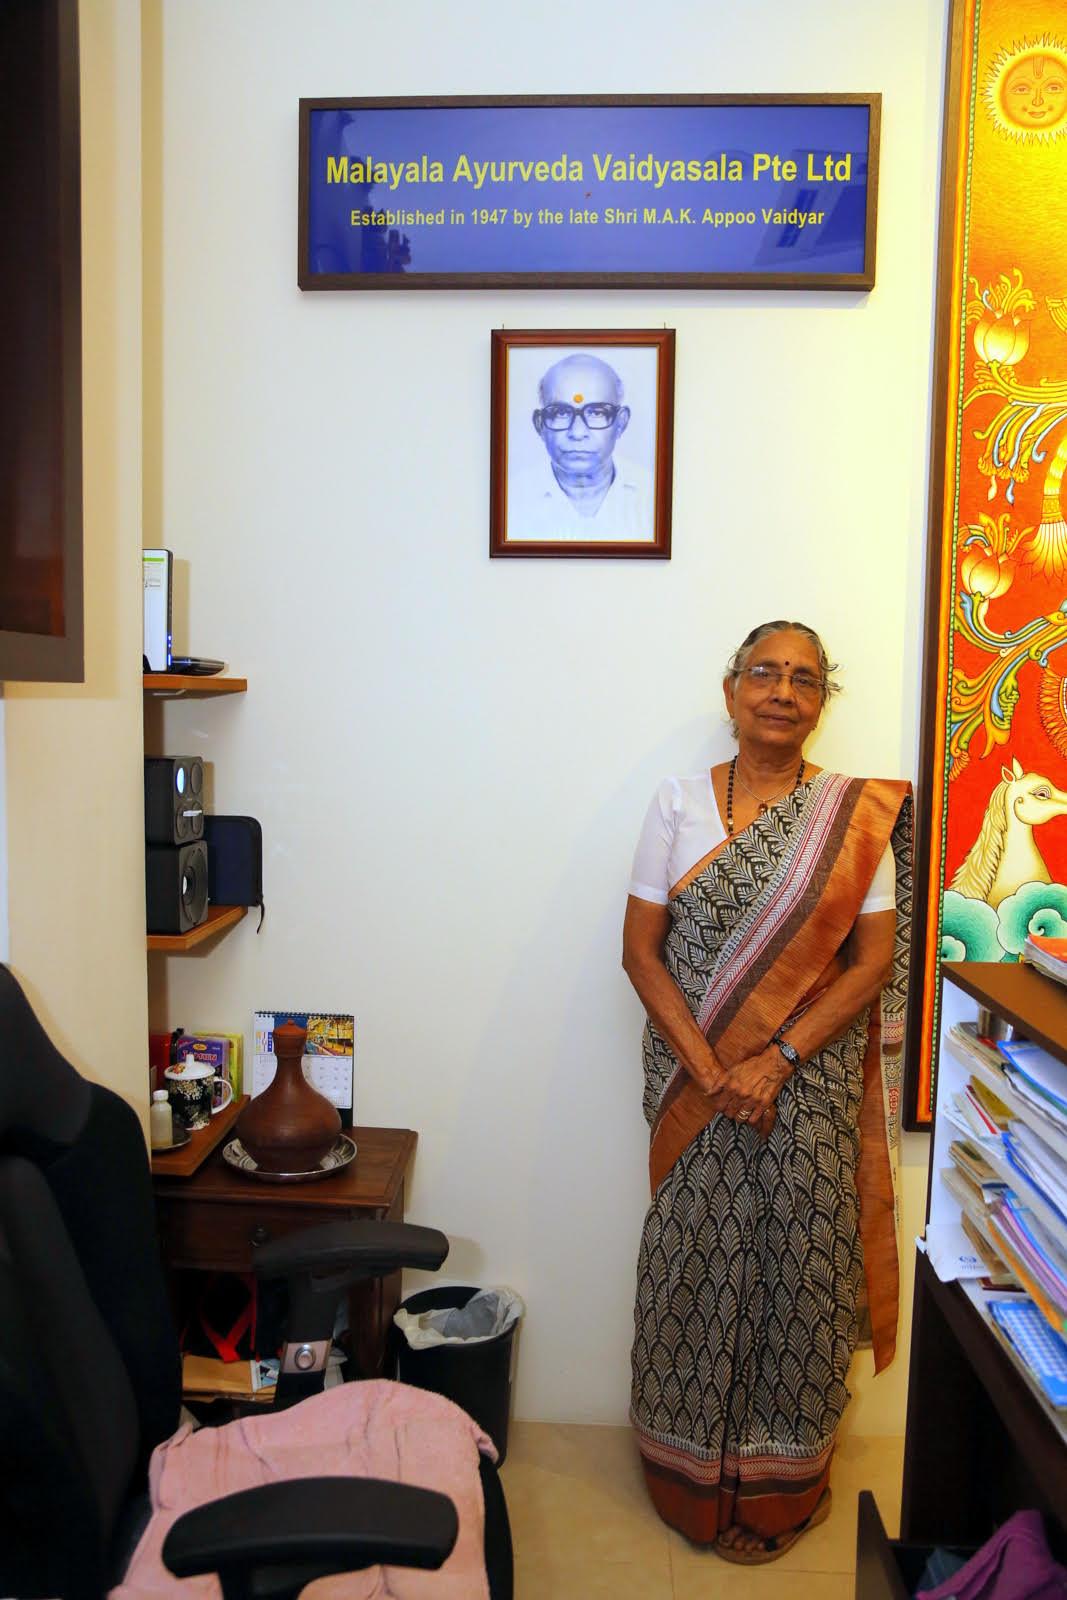 Open Business Malayala Ayurveda Vaidyasala